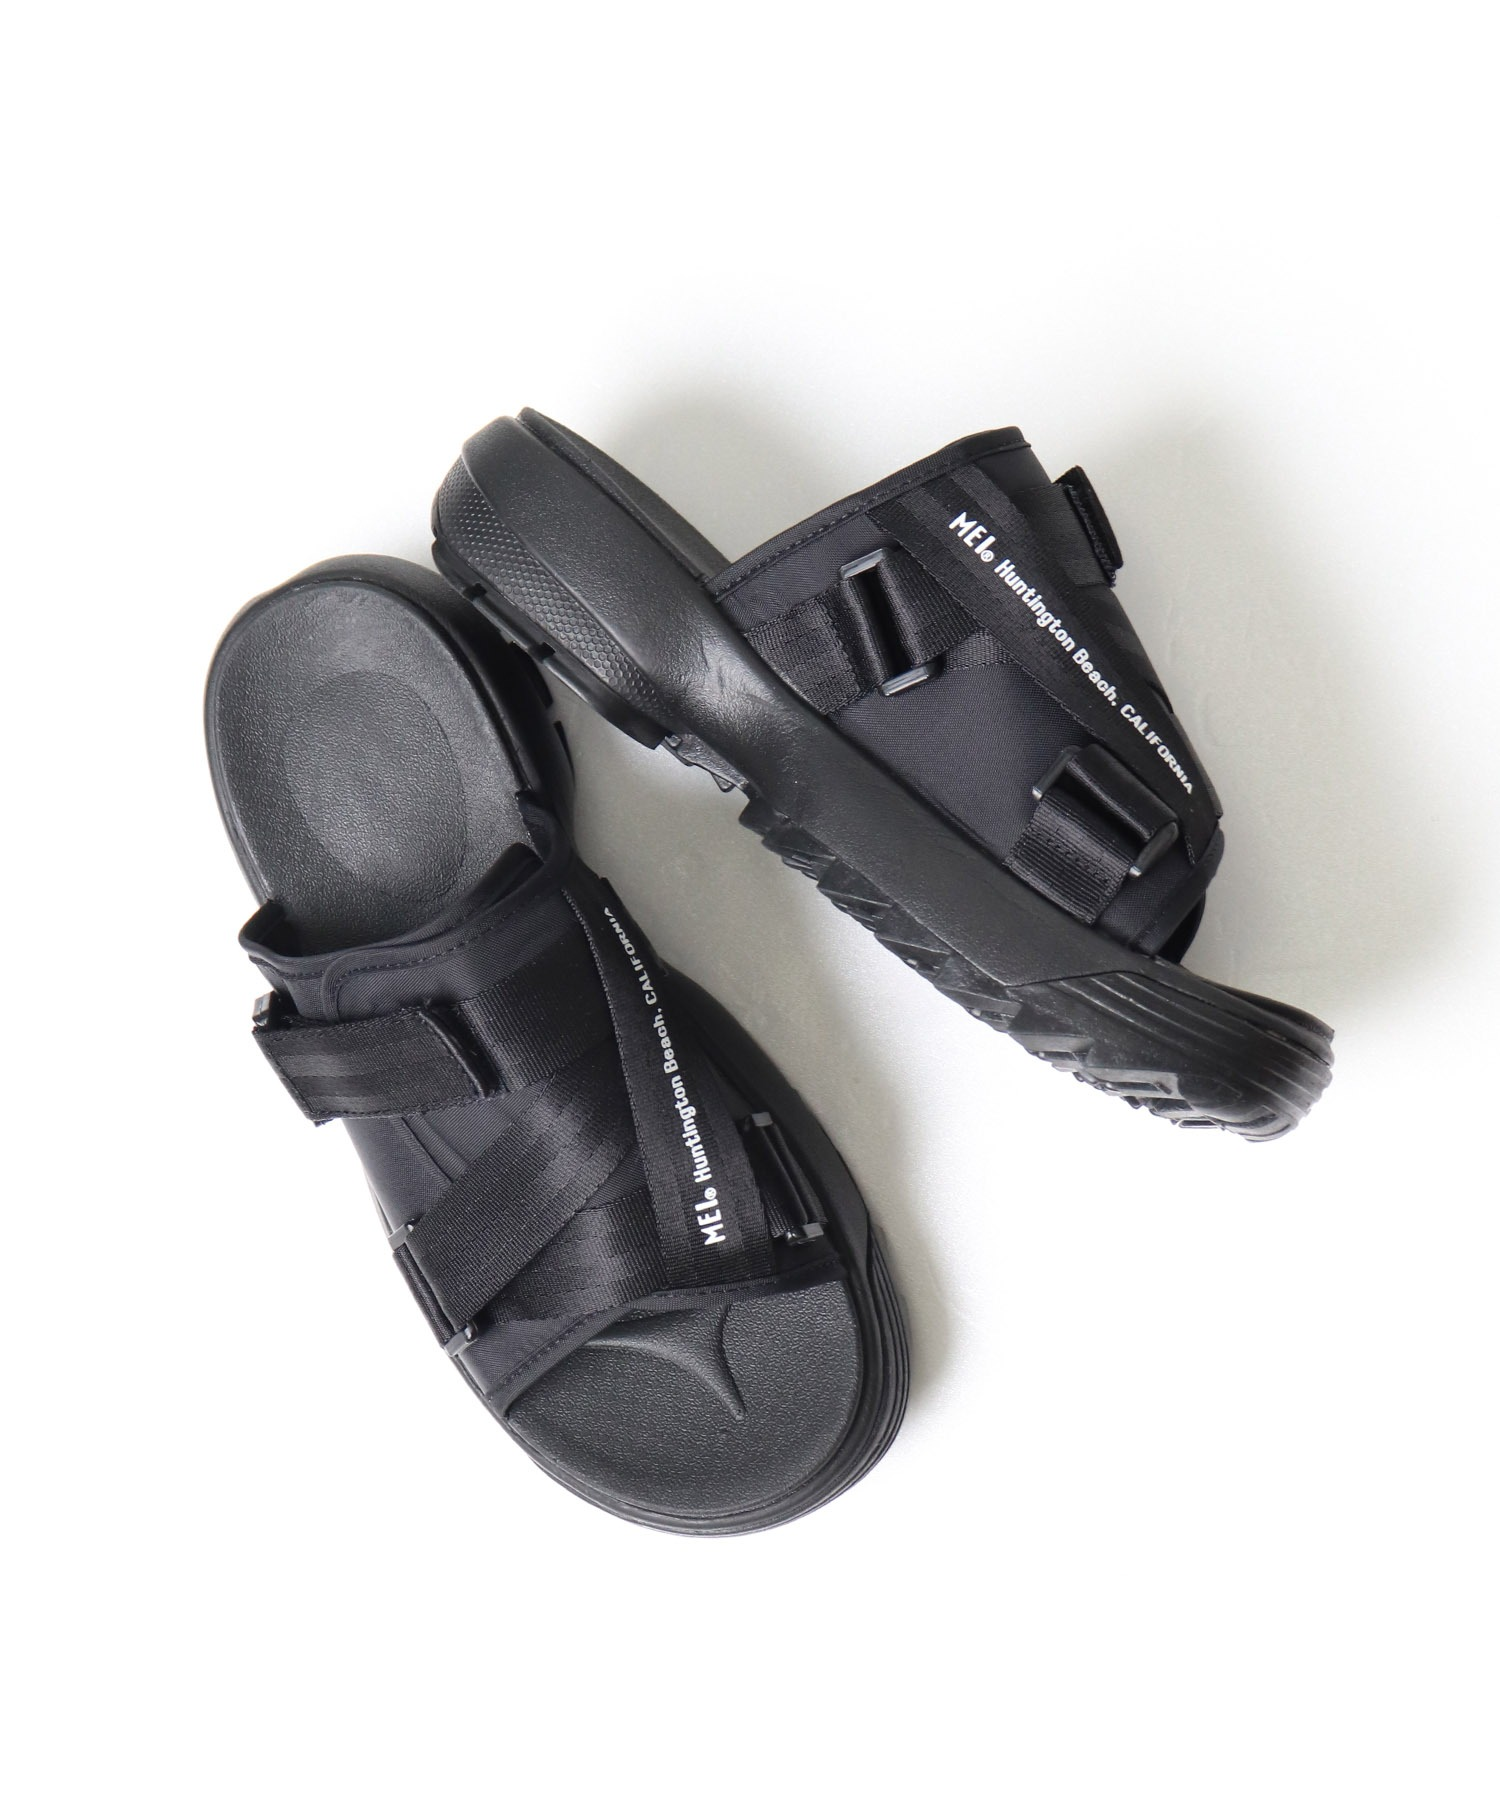 【 MEI / メイ 】Recycled nylonsandal ナイロンサンダル スポーツサンダル メンズサイズ 21SS